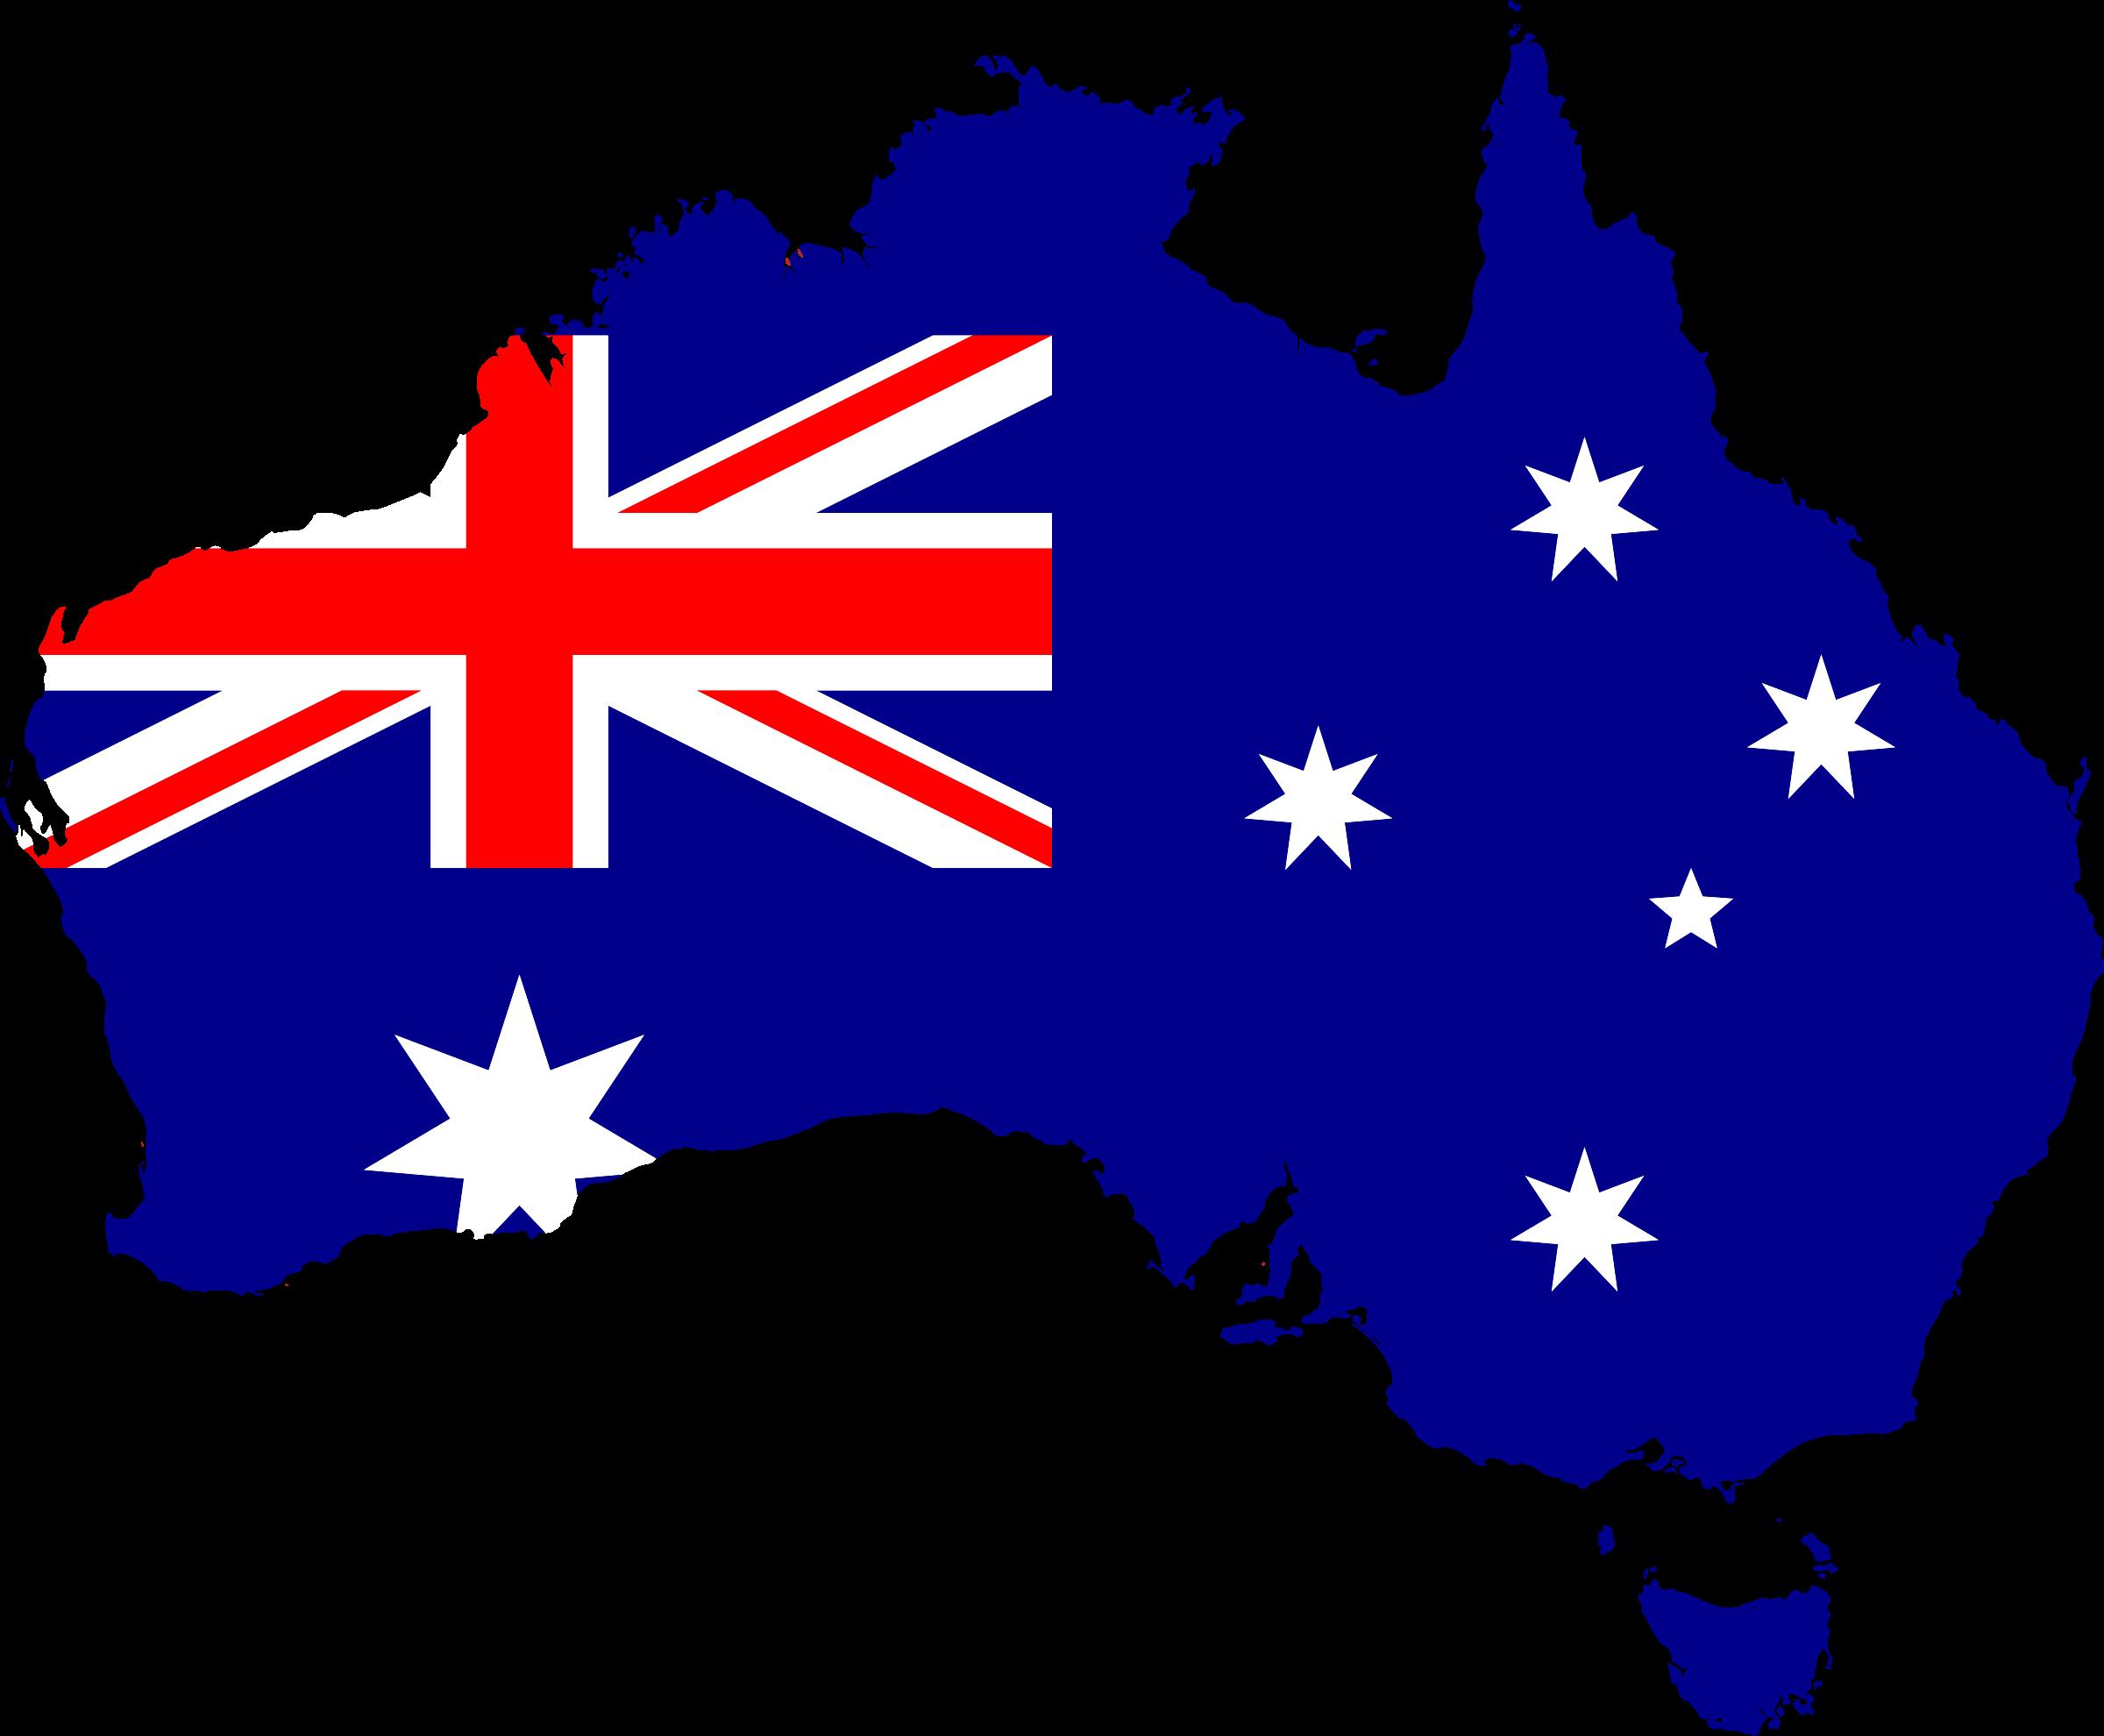 89723d510e3c22324111937c8099dbc2_big-image-png-map-of-australia-clipart_2400-1980